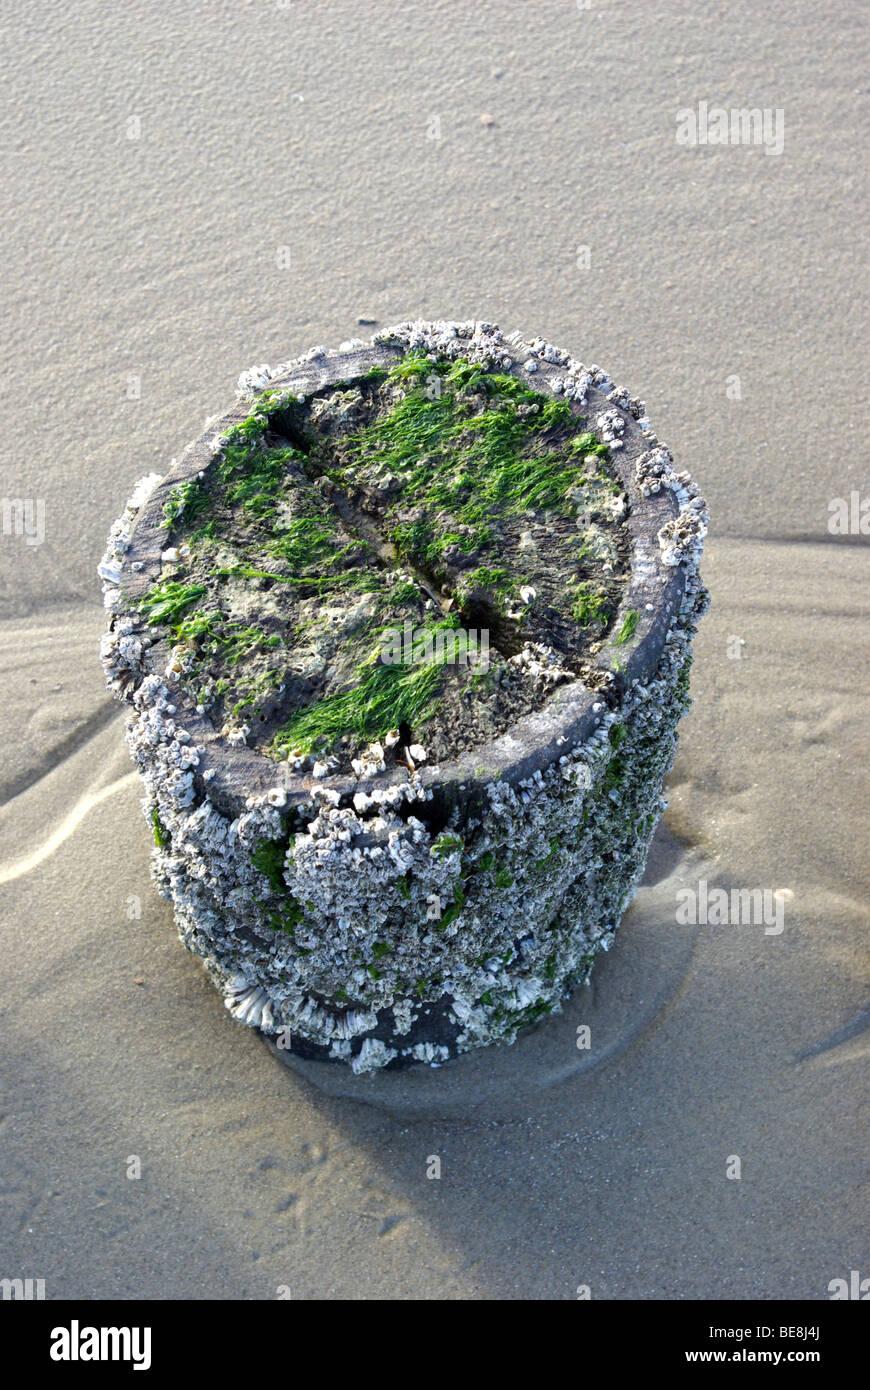 Strandpaal vol zeepokken en zeesla bij eb op het strand; Range pile full Sessilia and Green alga Stock Photo